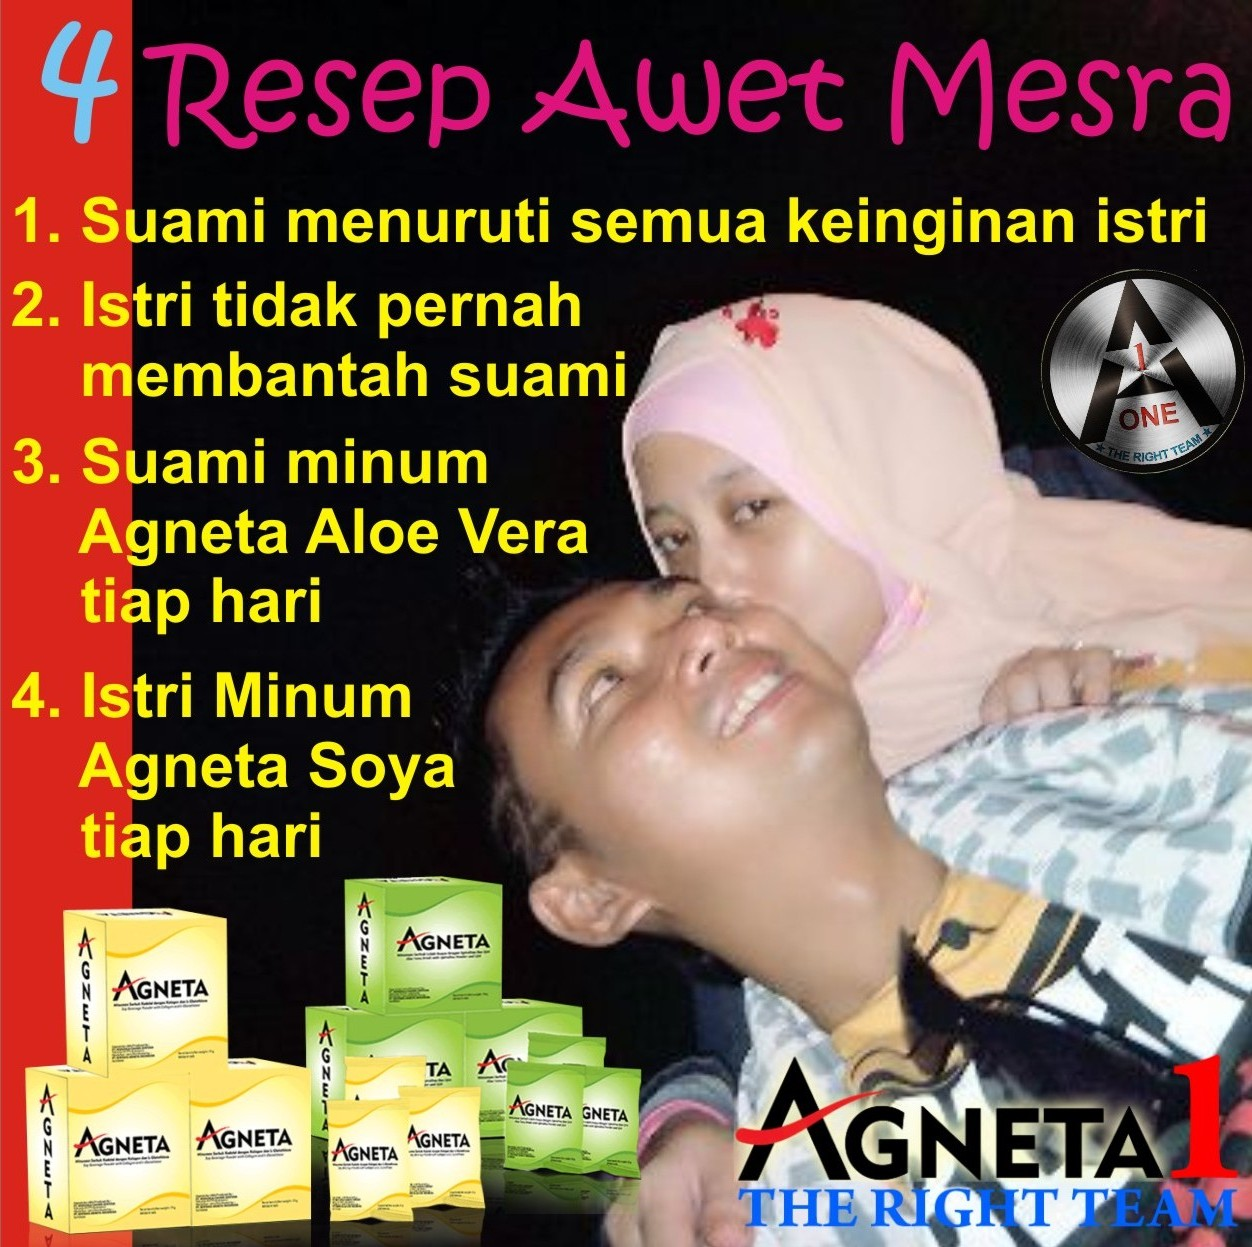 Resep Awet Mesra Agneta